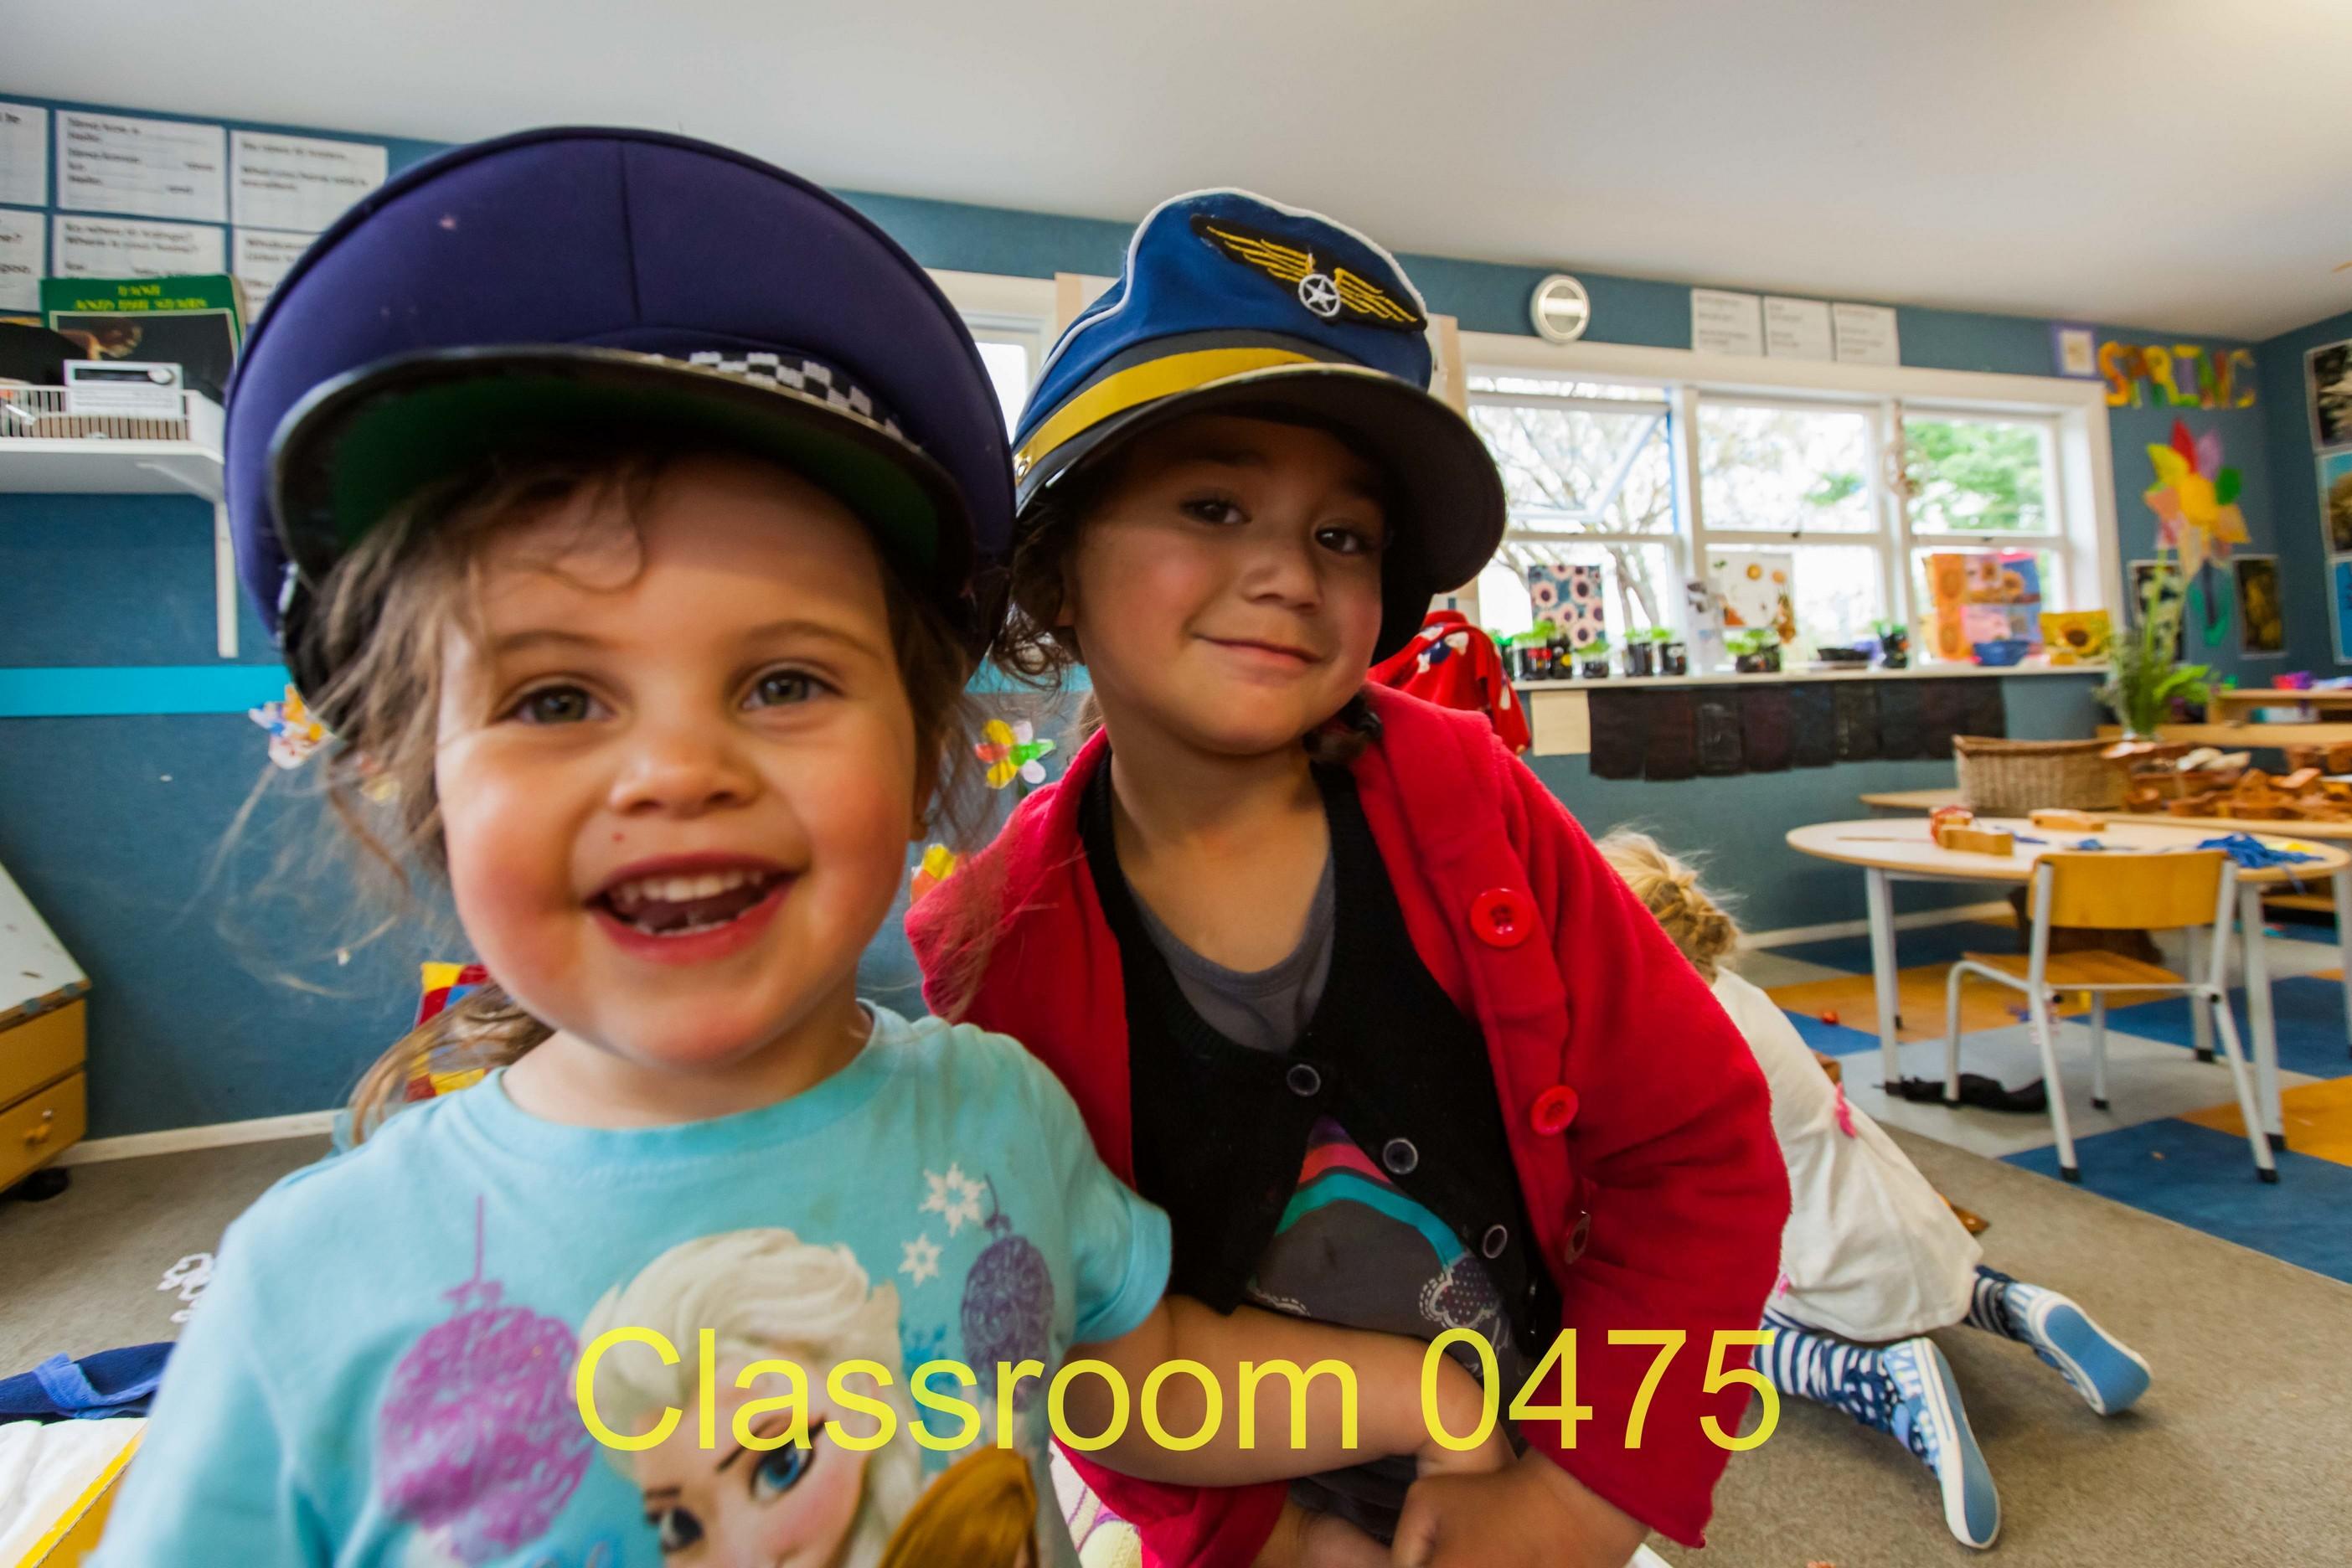 Classroom 0475